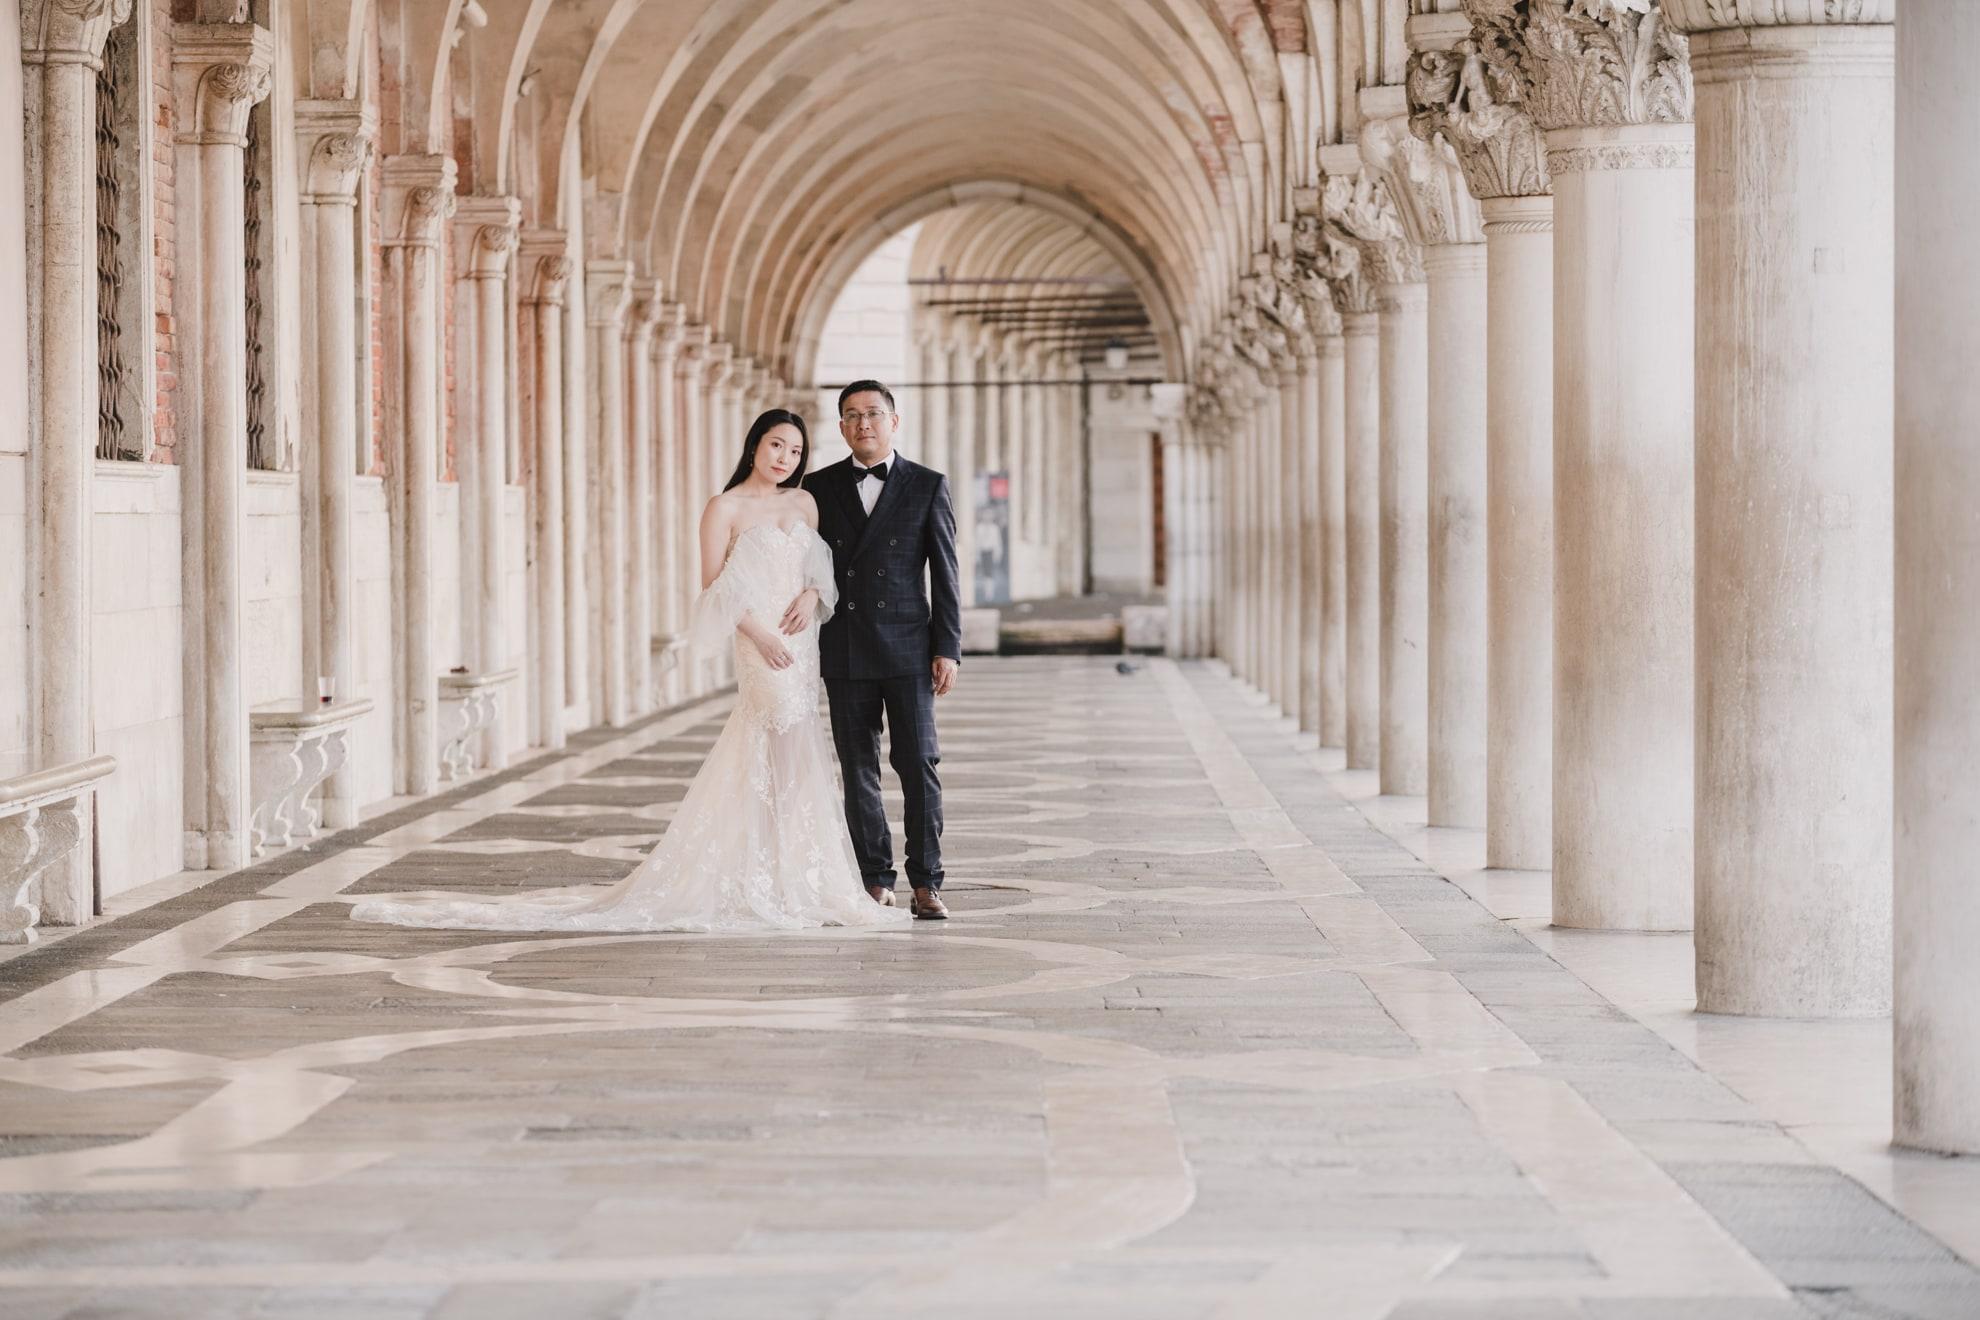 engagement venice venezia proposal proposta matrimonio fidanzamento irene pollacchi fotografa 26